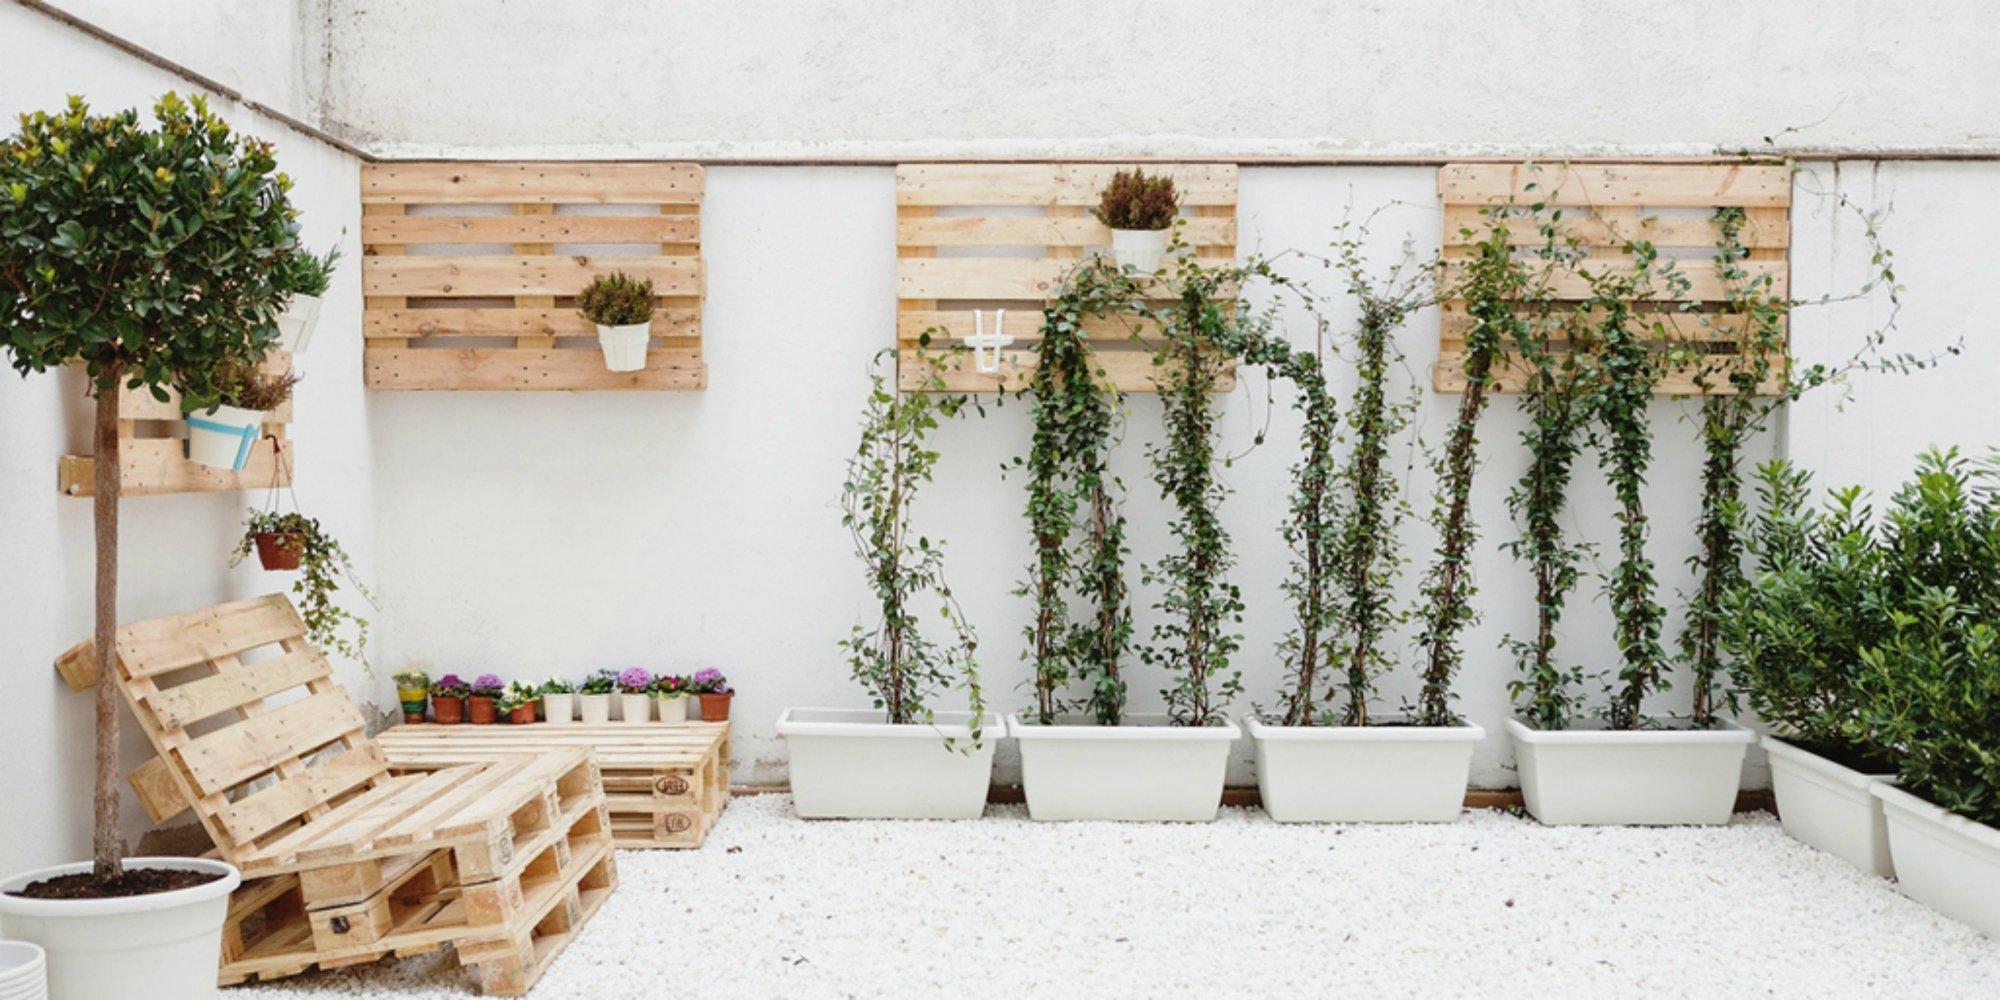 Gartenmobel paletten bauanleitung dekoration - Sitzmobel aus paletten ...